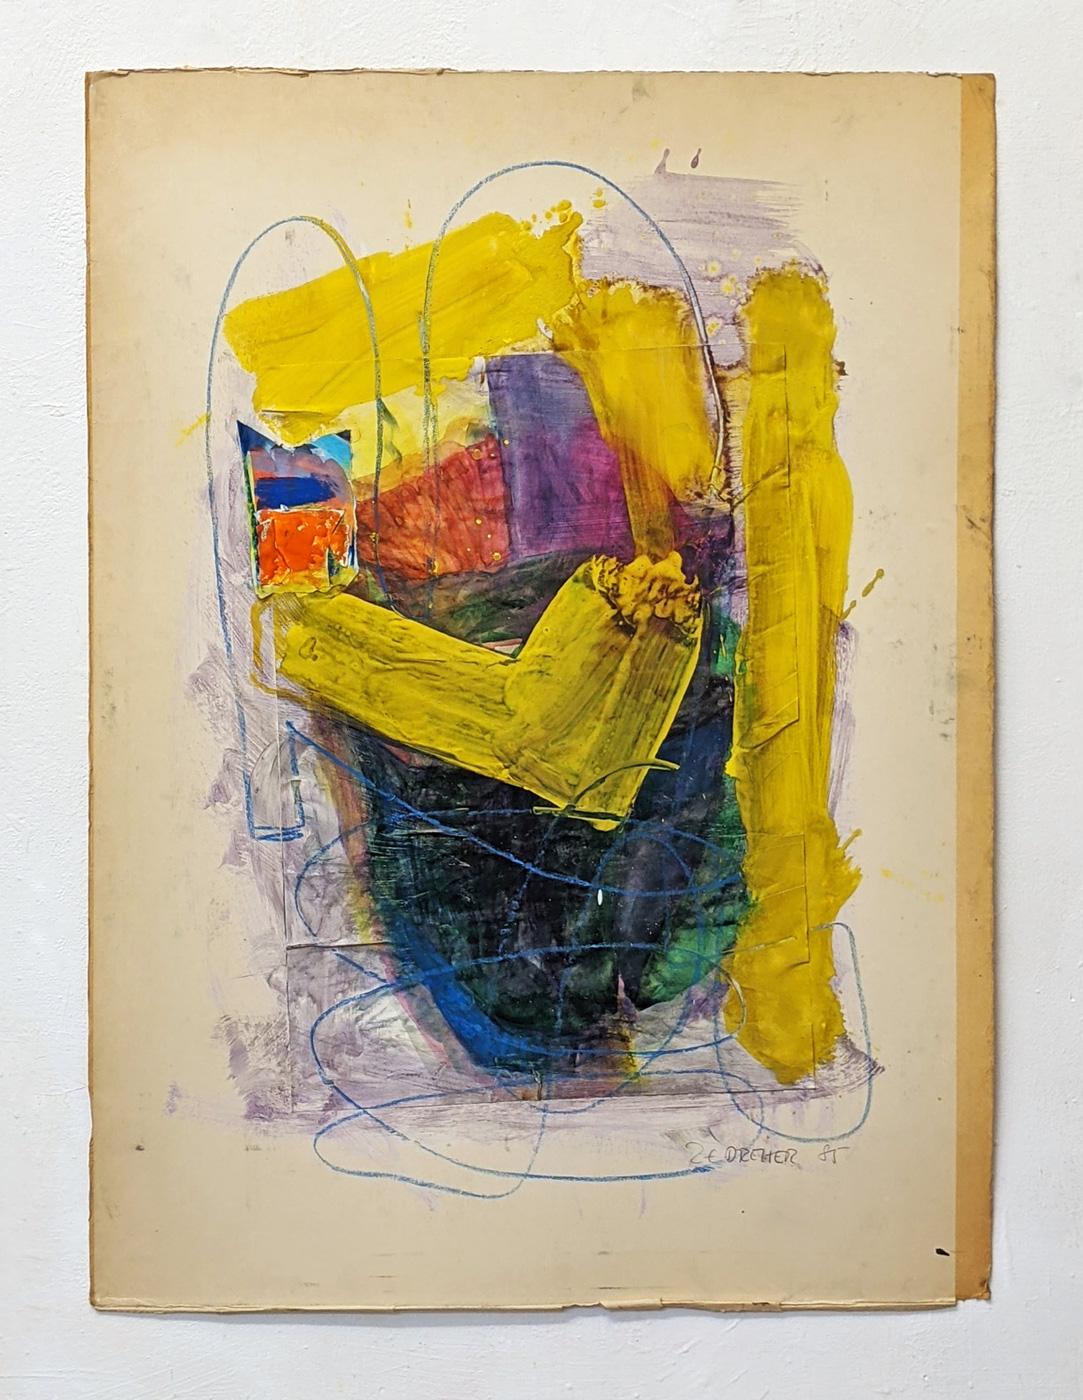 """Geste in Gelb"", 100 x 74 cm, Acrylfarbe, Kreide, Pappe, 1985"